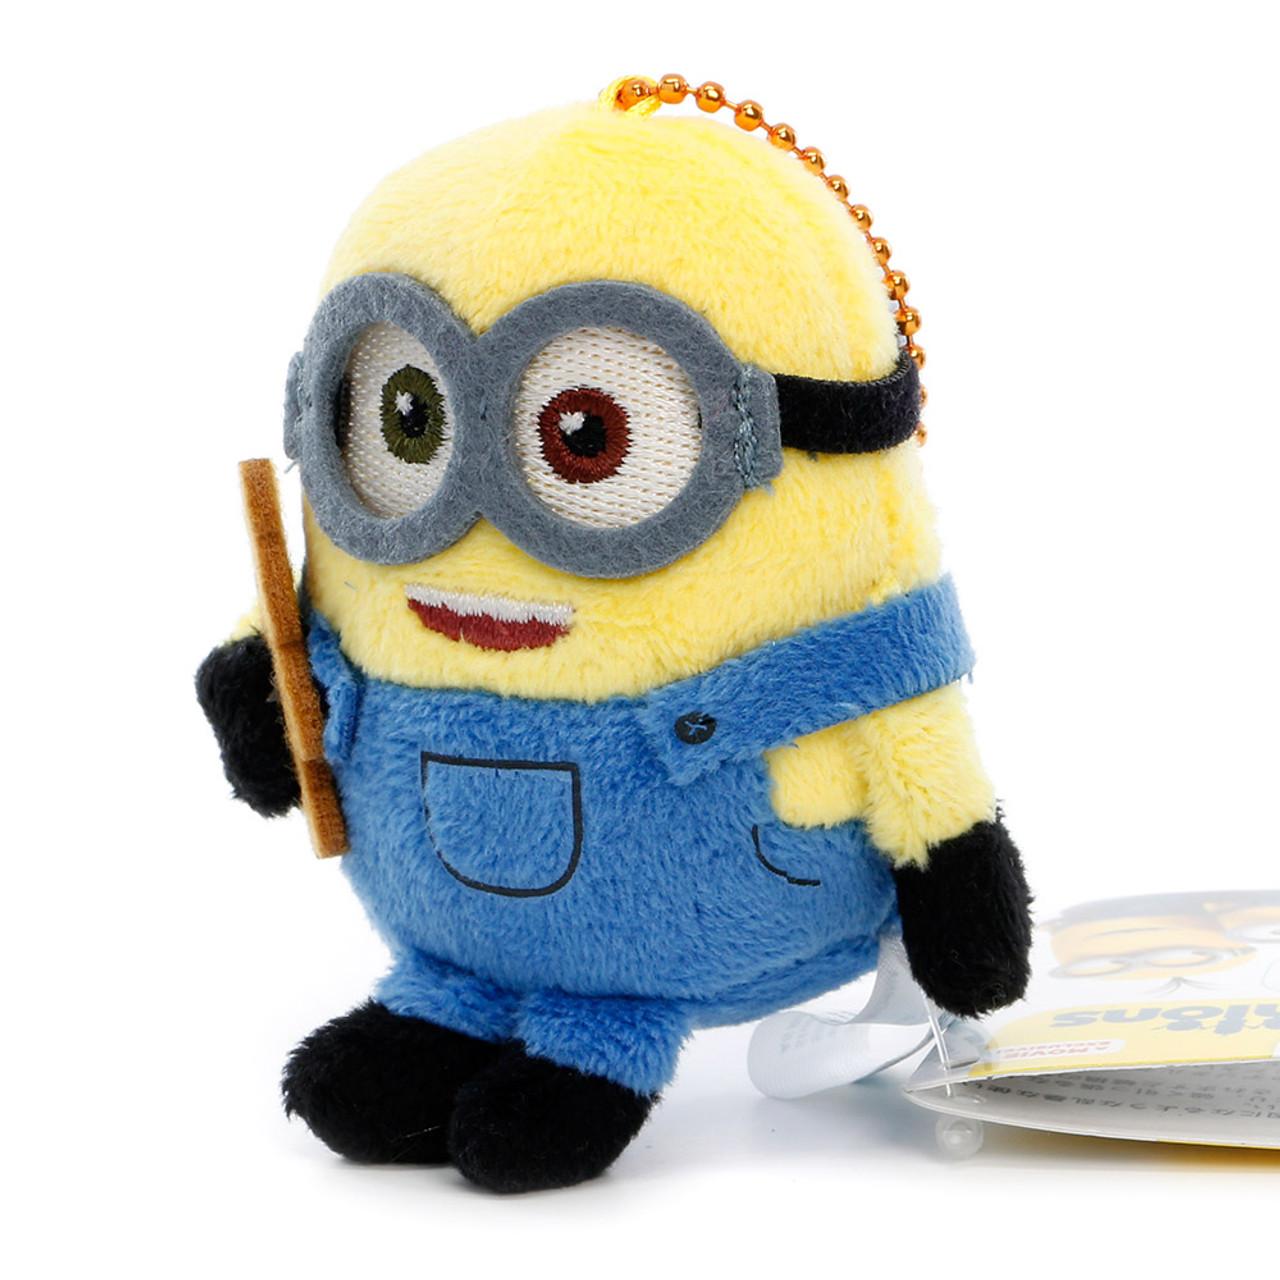 Bob The Minions Mascot Plush Keychain ( Side View )